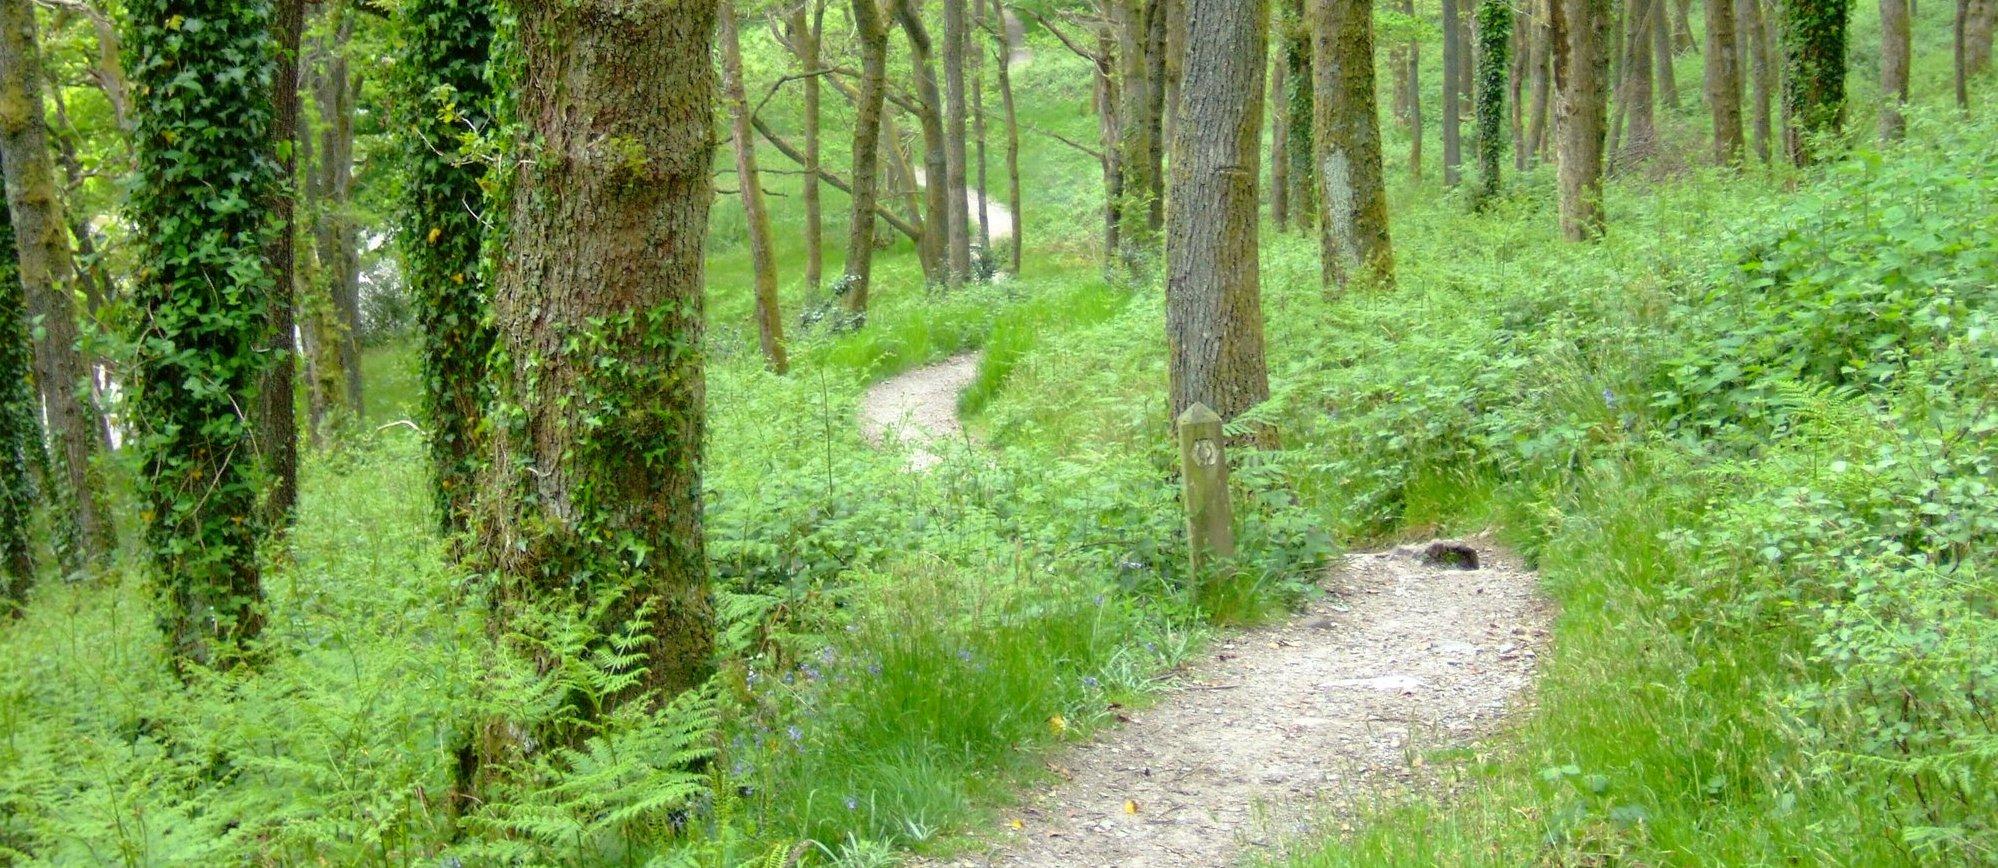 Into the trees beside Loch Lomond